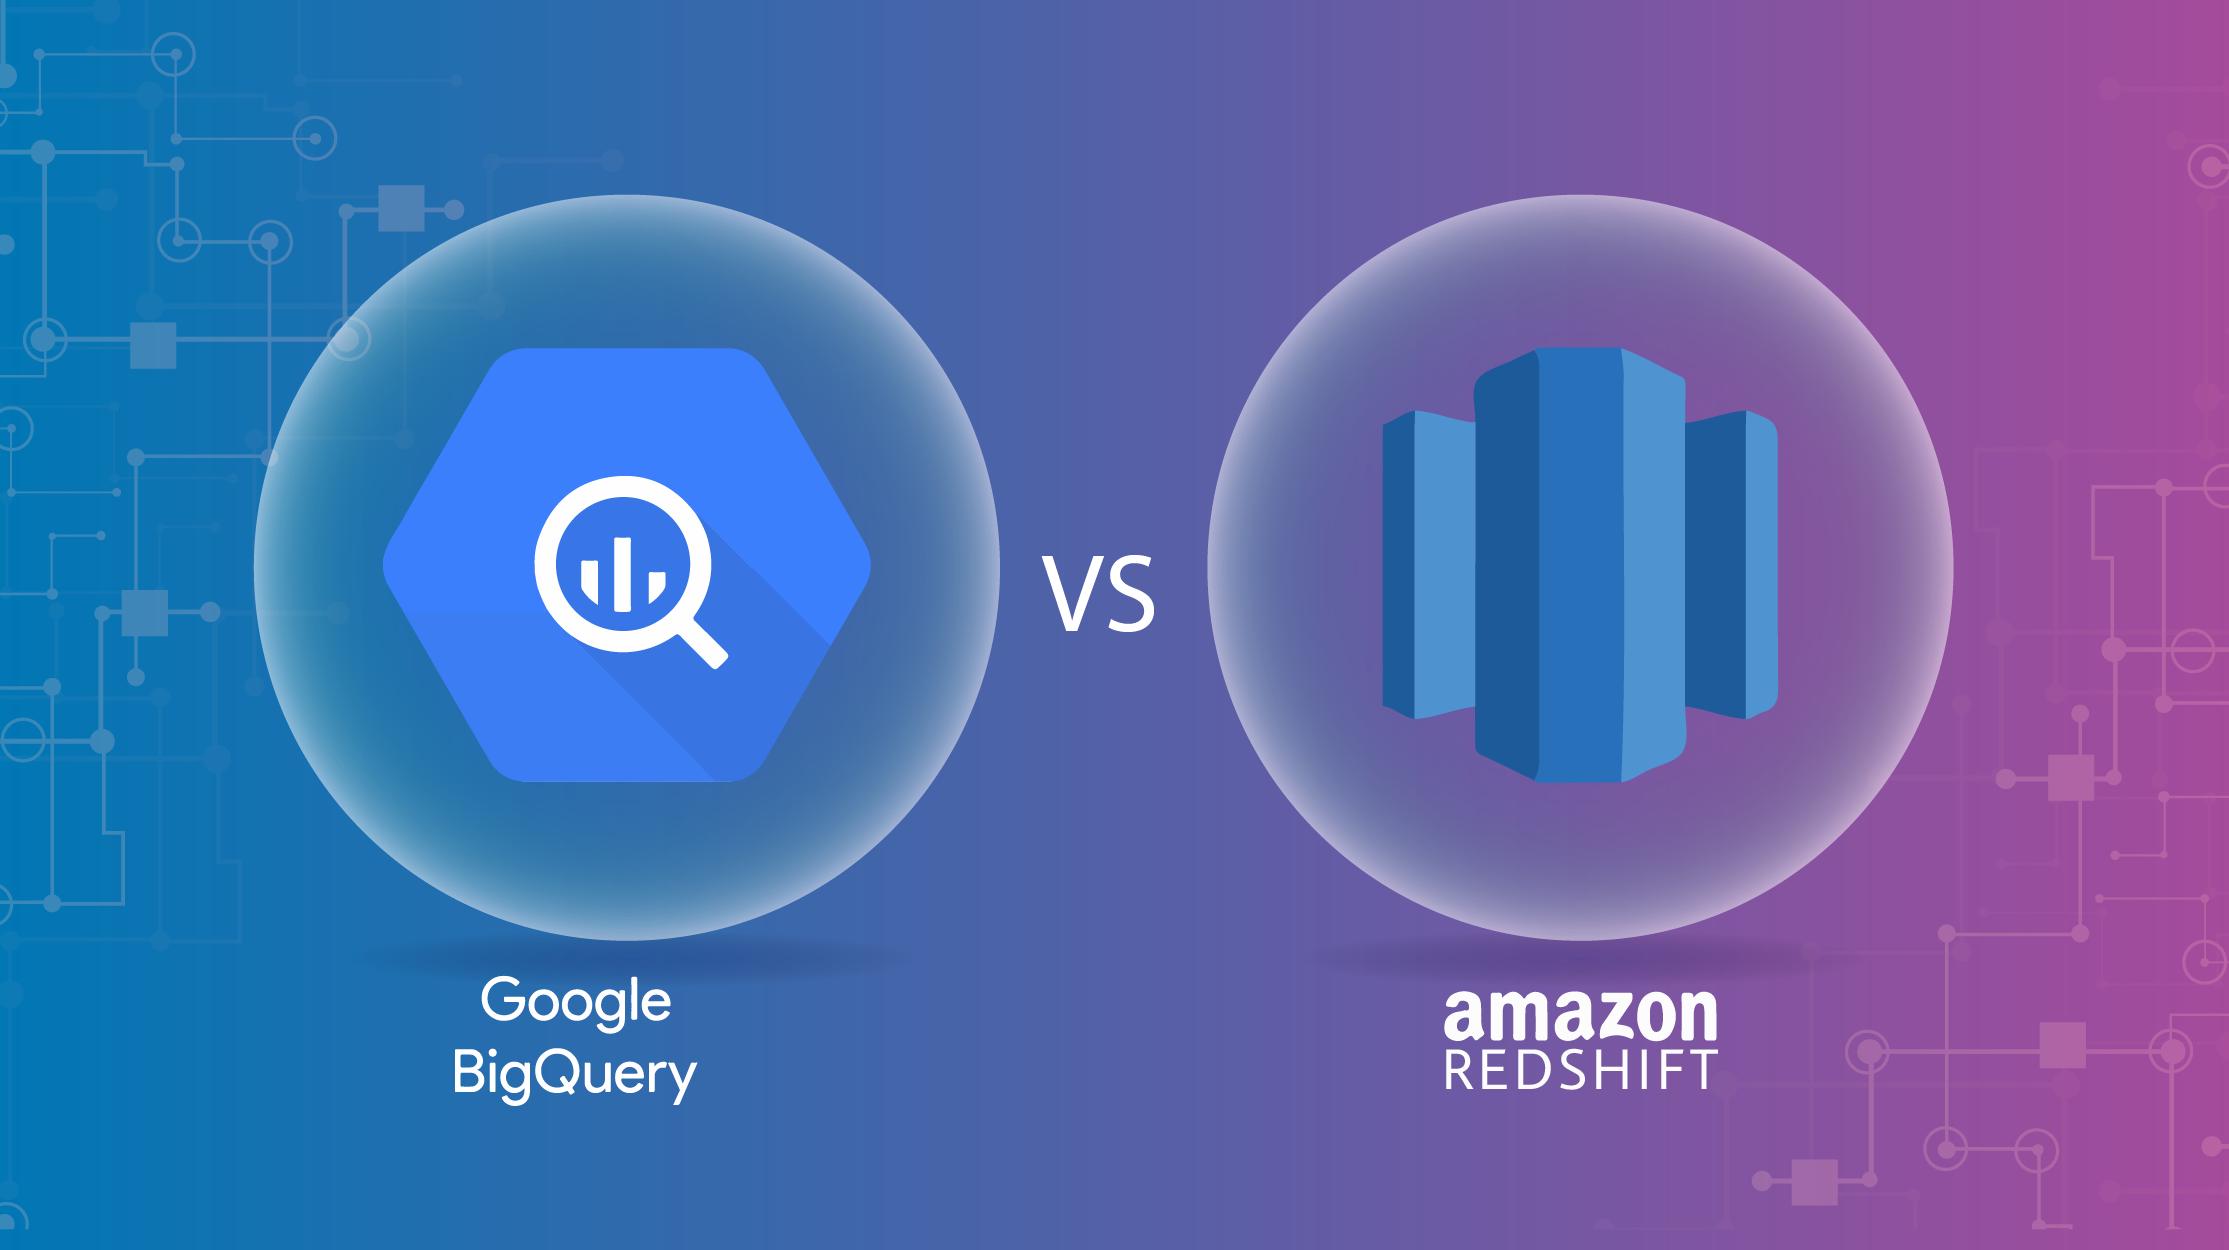 BigQuerry vs Amazon Redshift